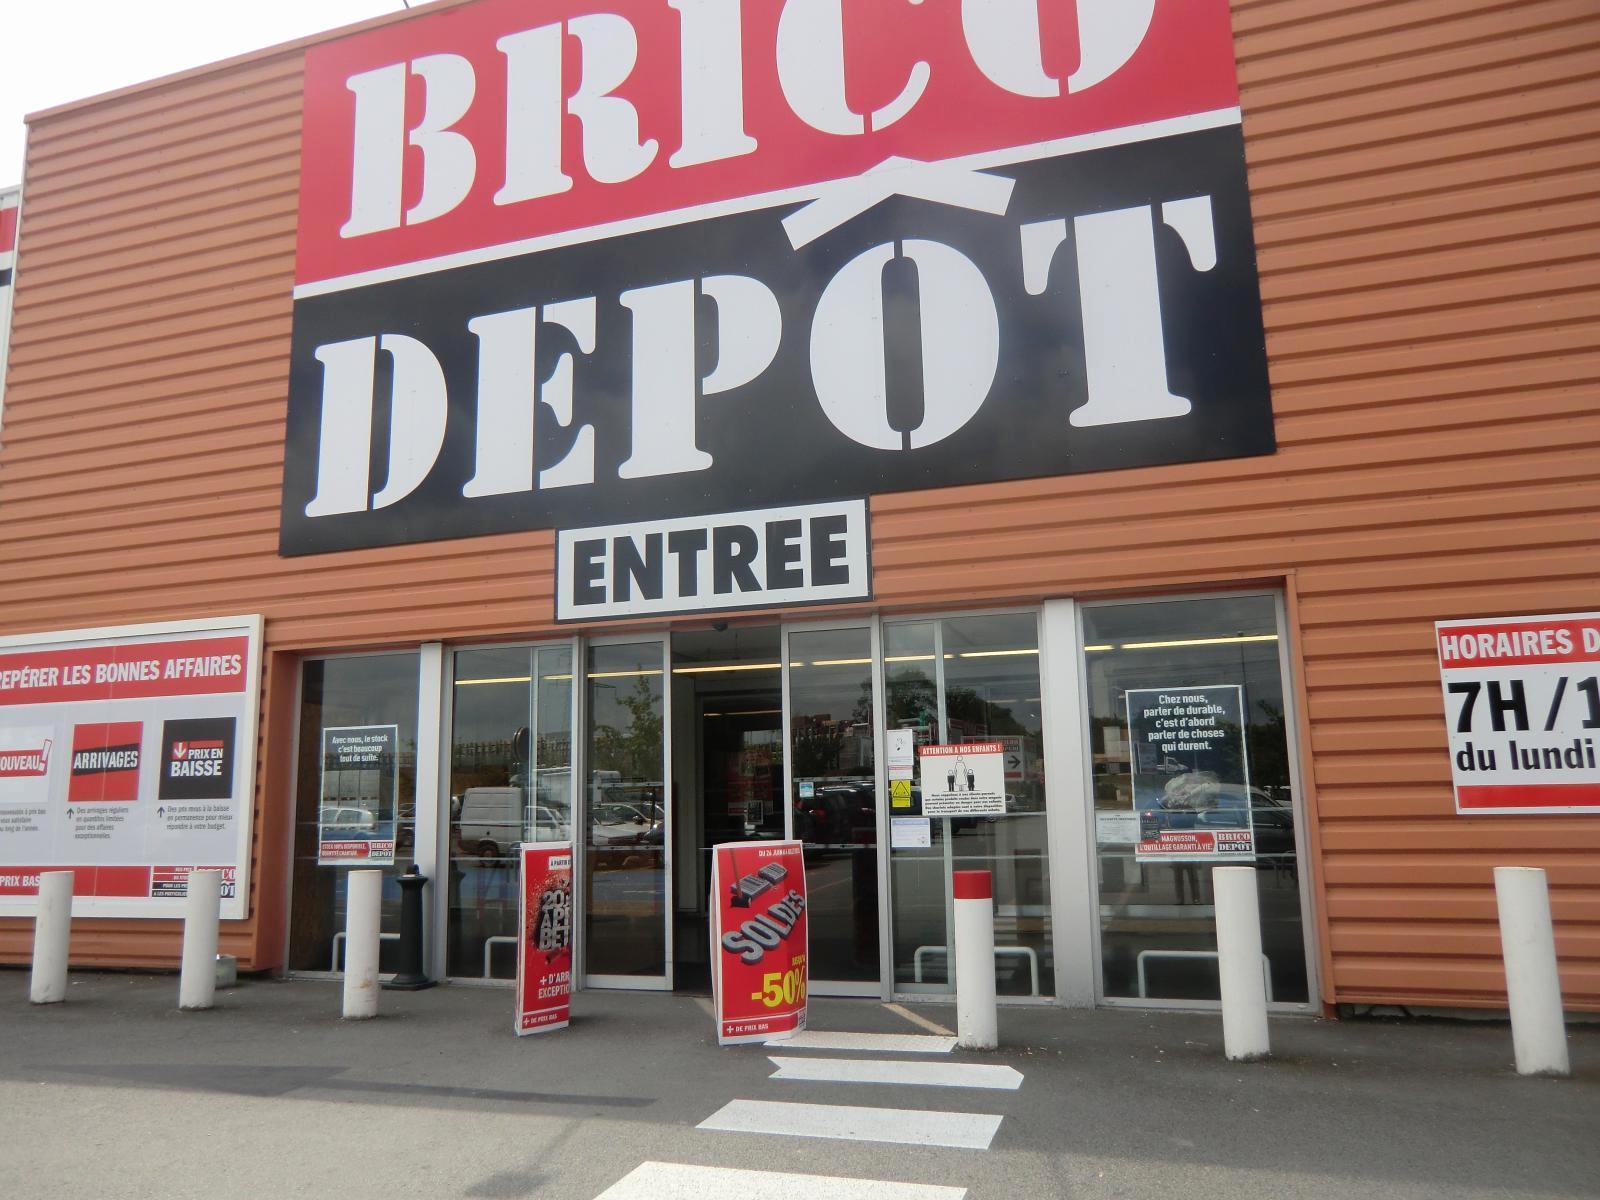 Sacoche Outils Brico Depot Impressionnant Image 31 Beau S De Enduit Facade Brico Depot